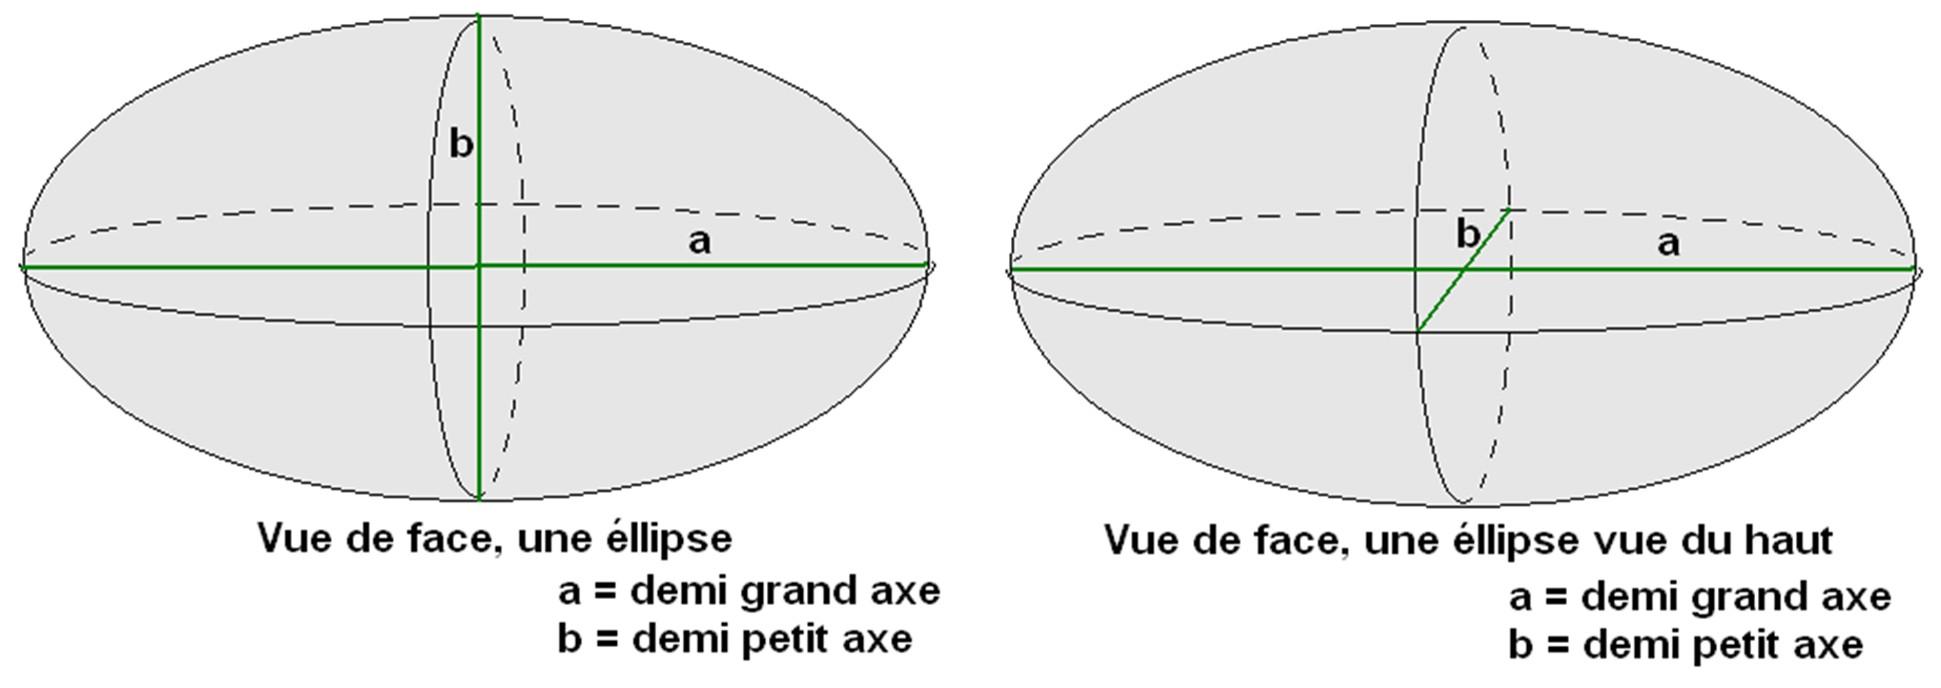 forme ellipsoidale